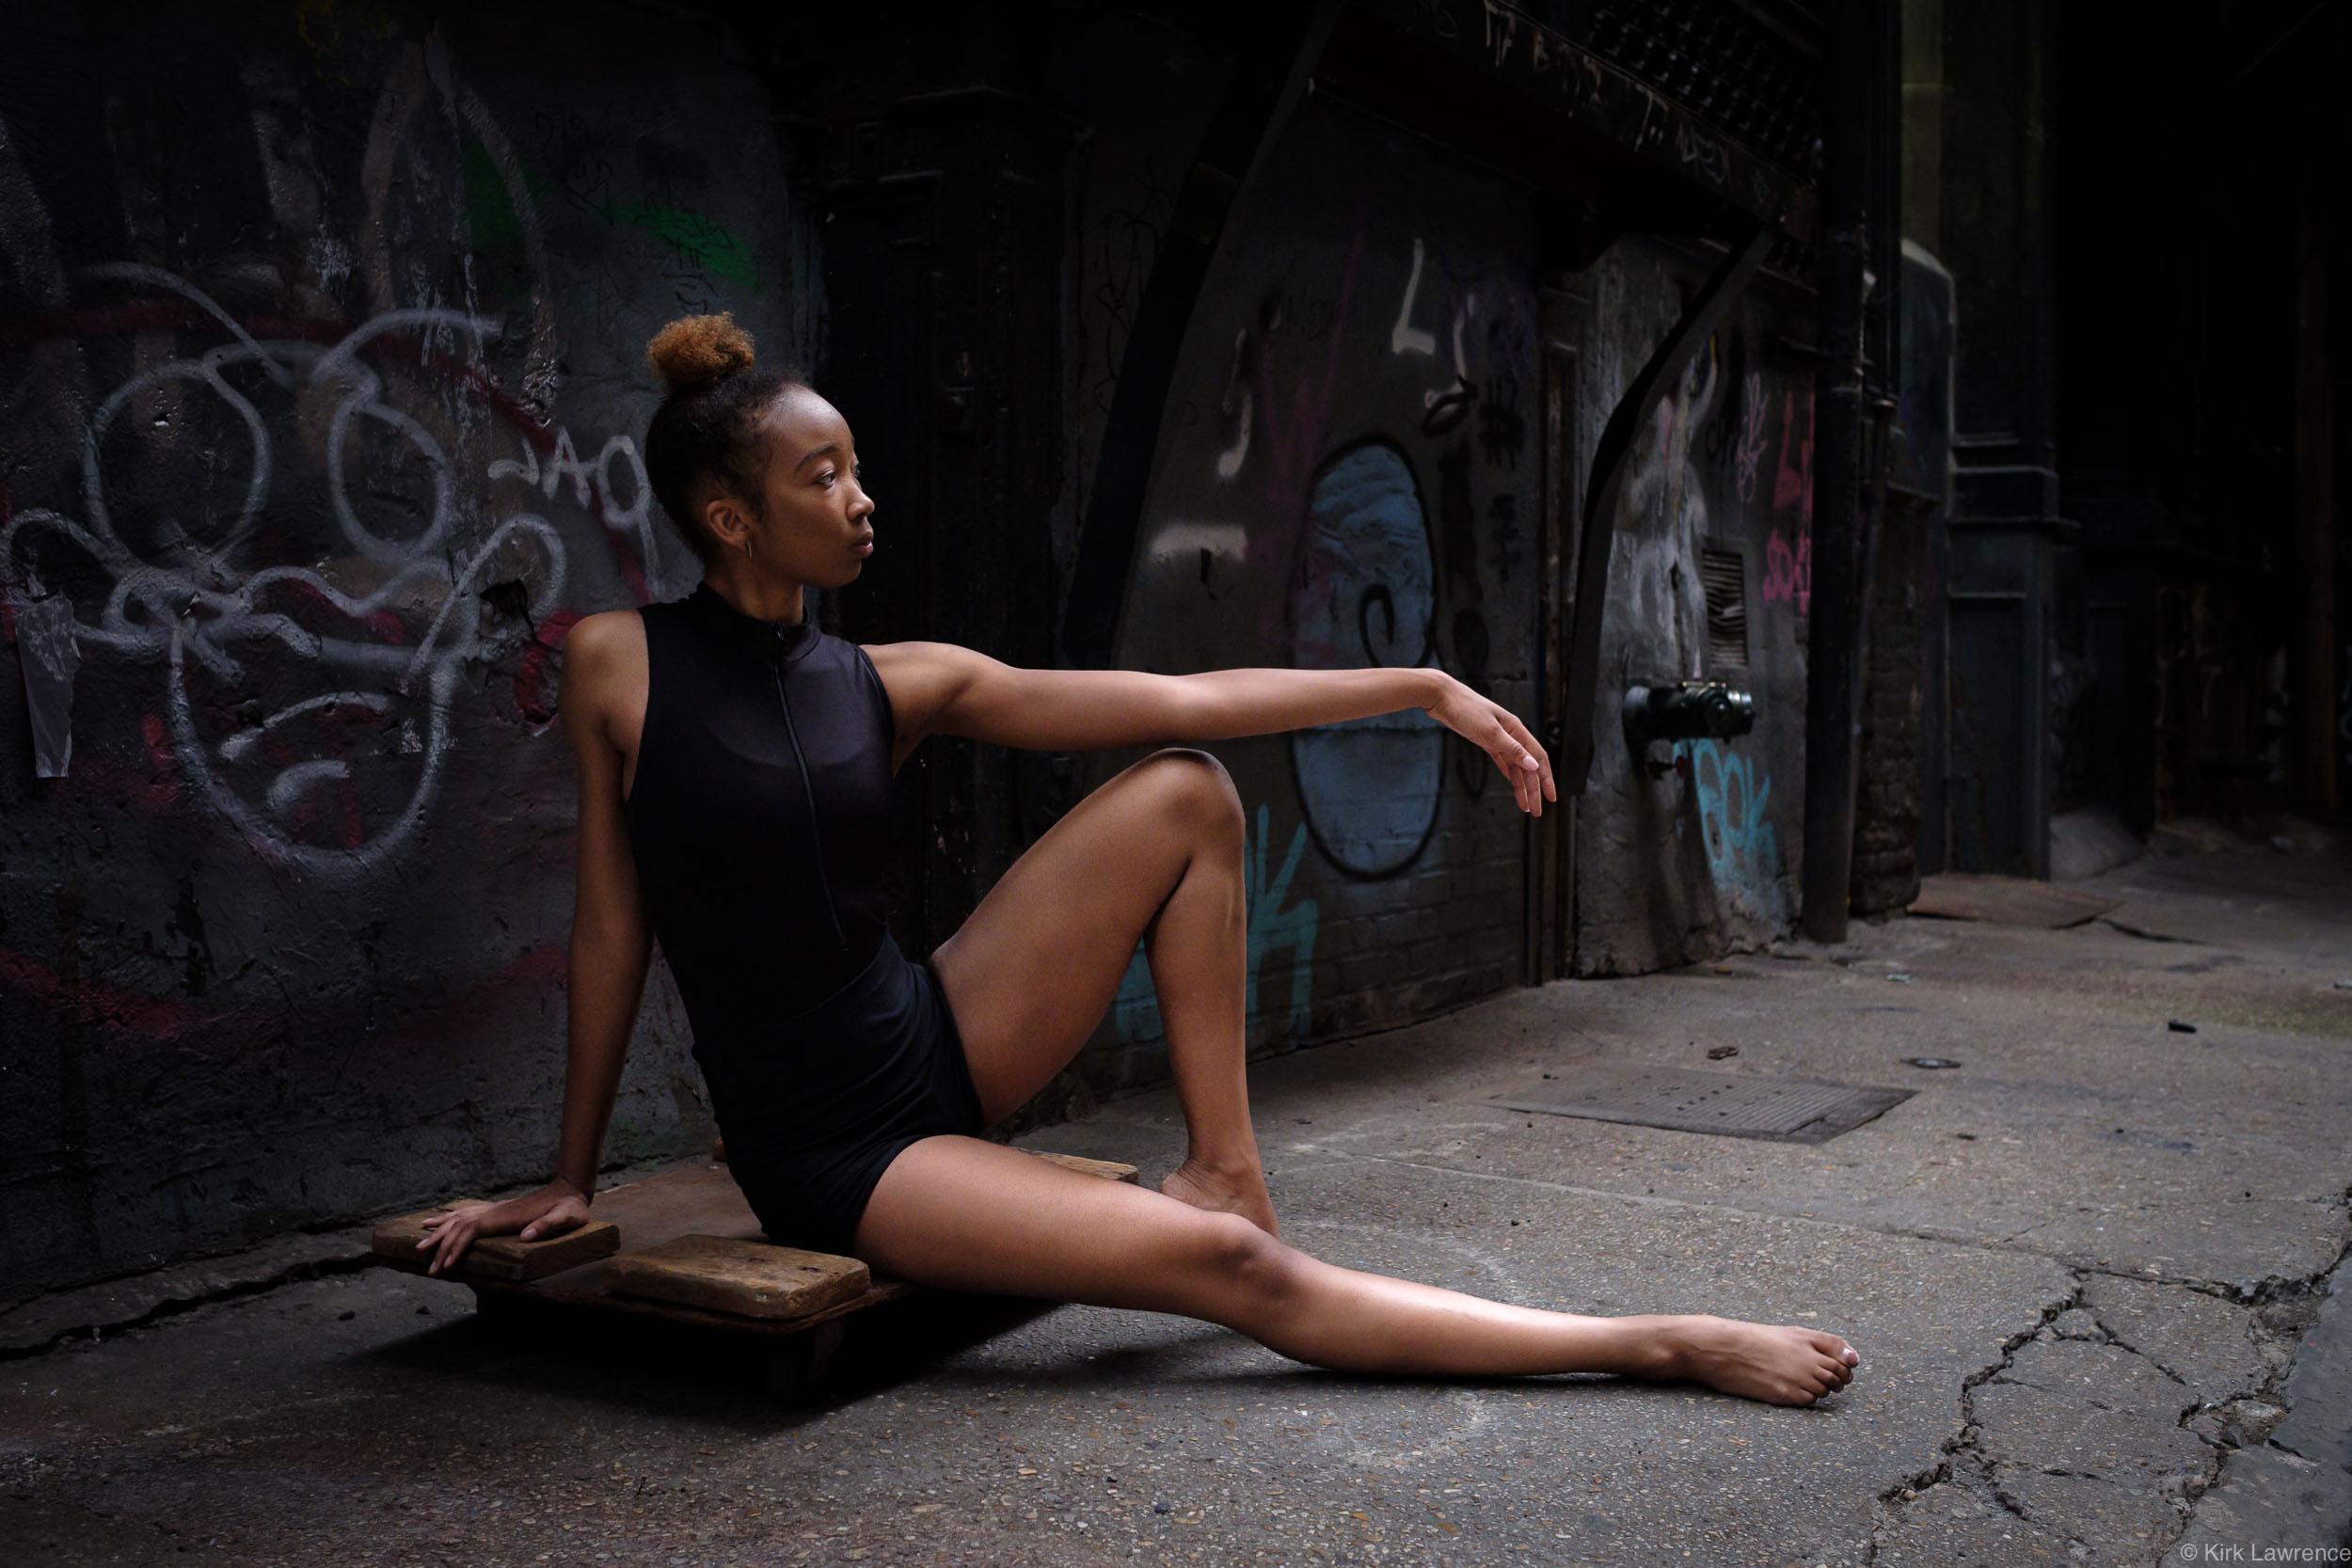 modern_dancer_New_York_City_alley_portrait.jpg